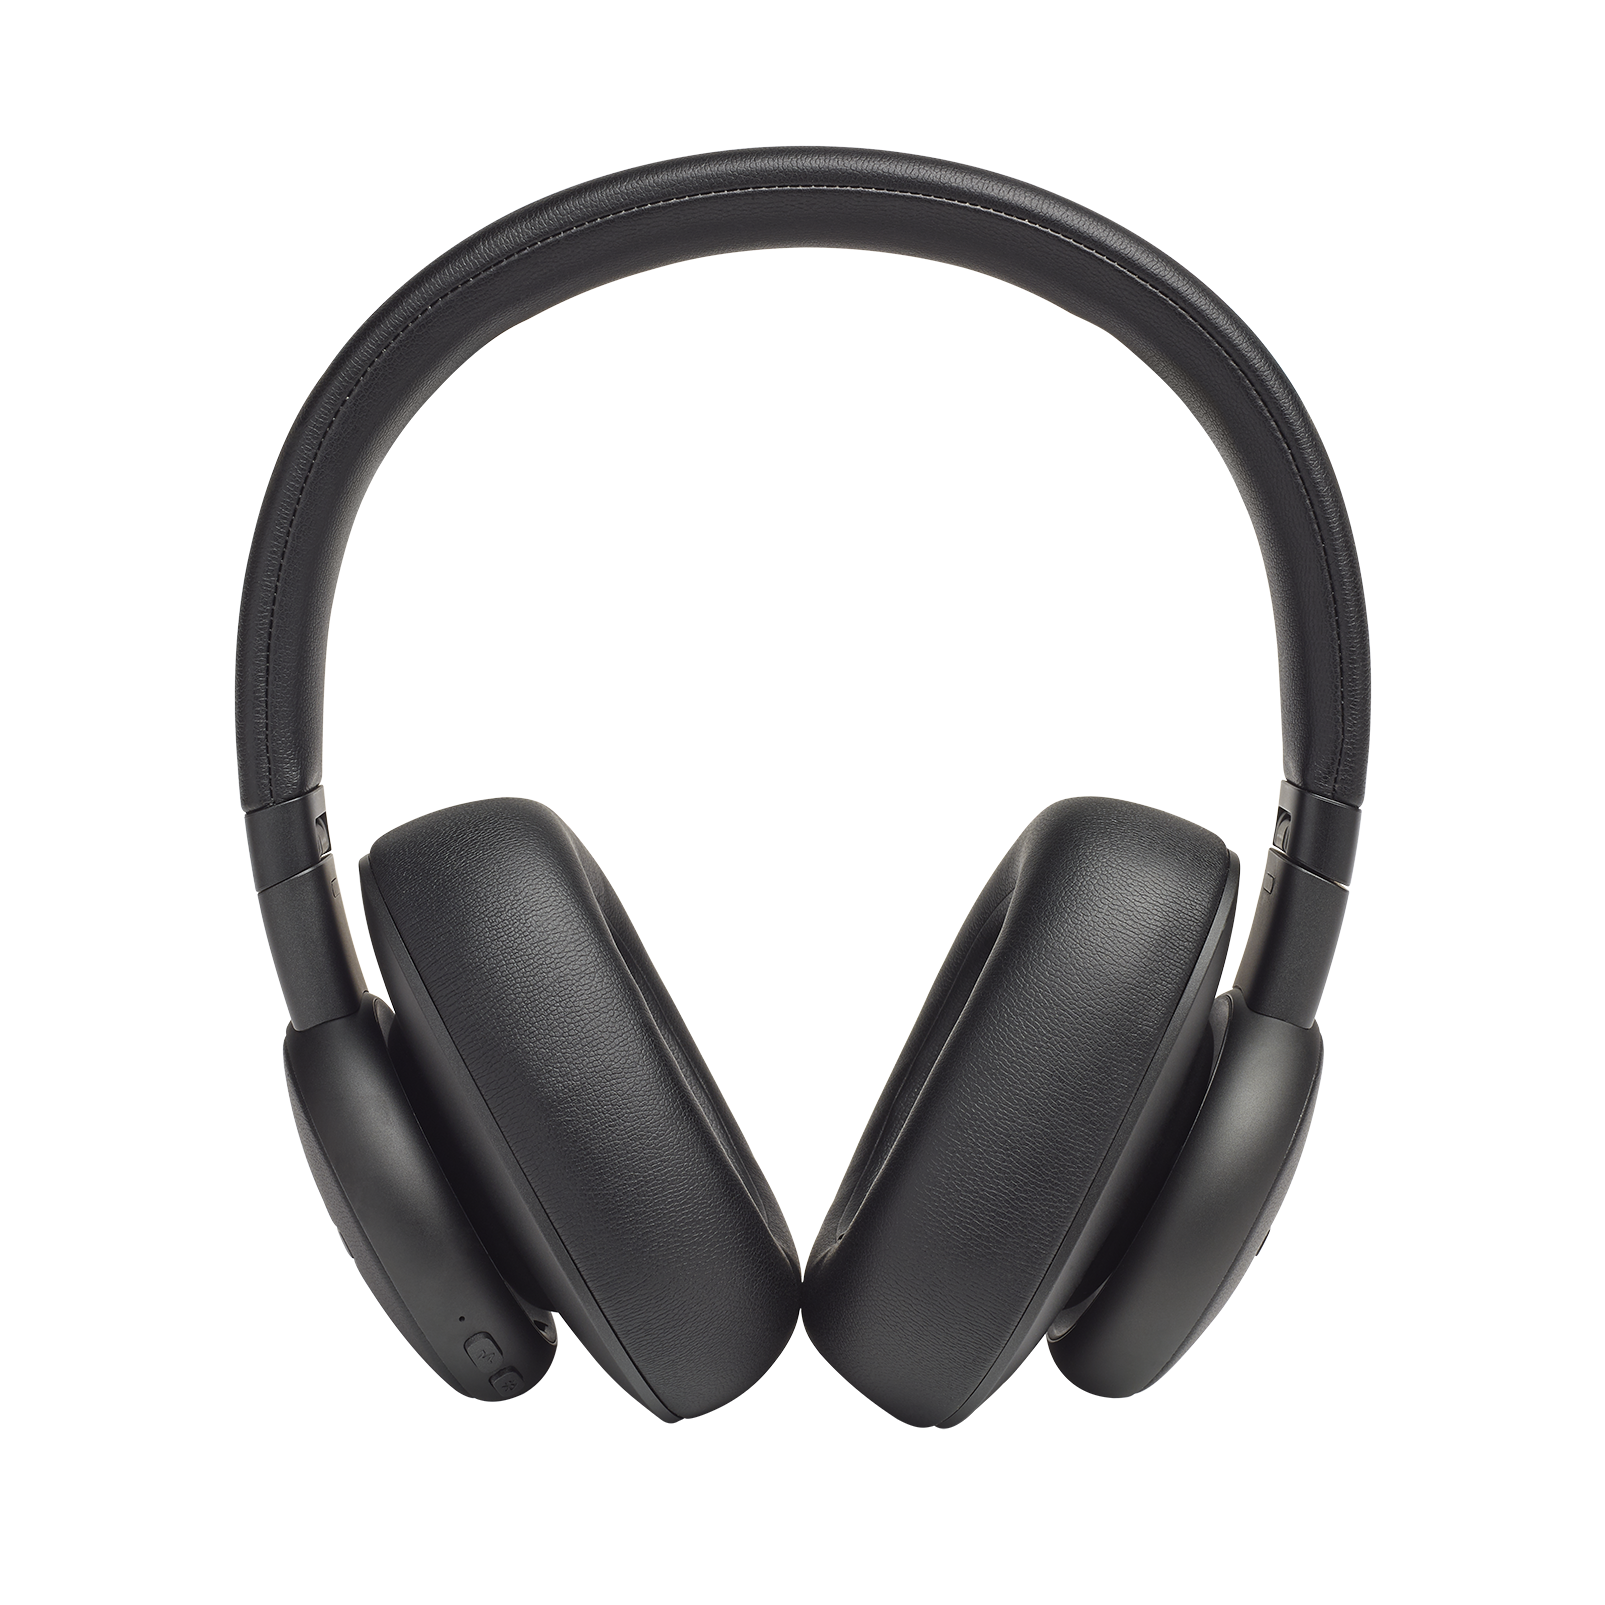 Harman Kardon FLY ANC - Black - Wireless Over-Ear NC Headphones - Front